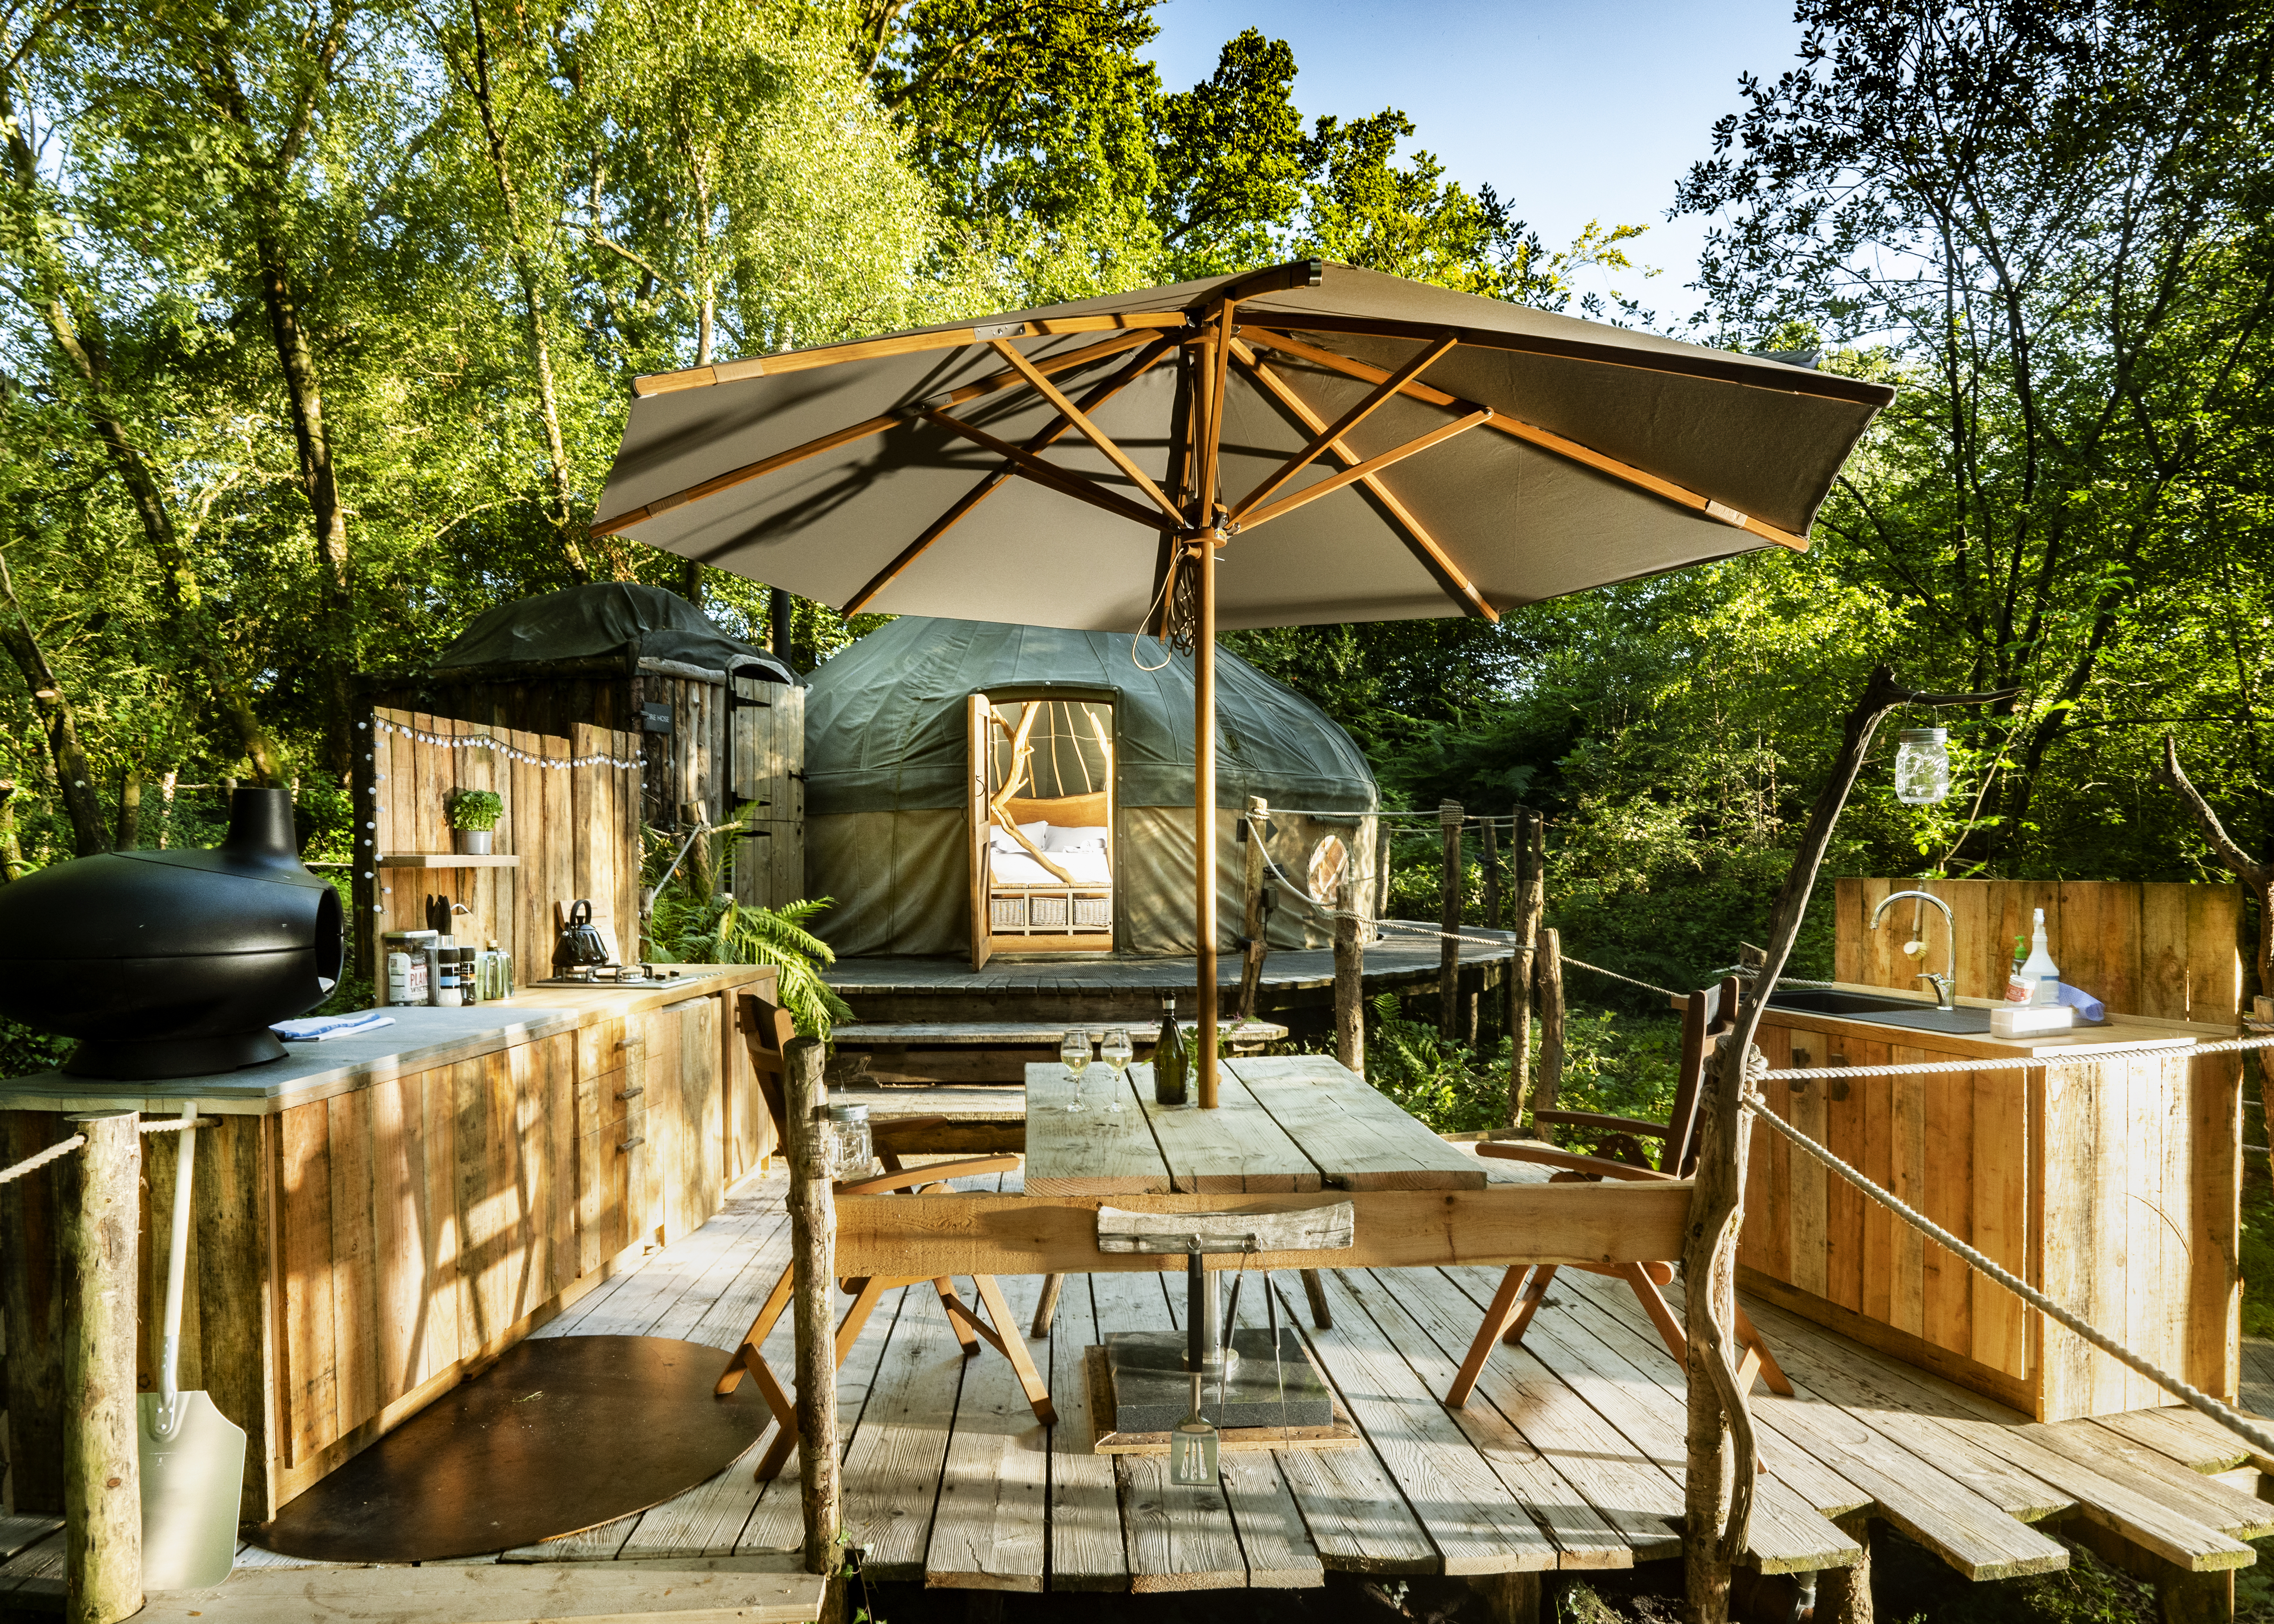 Coracle the Yurt